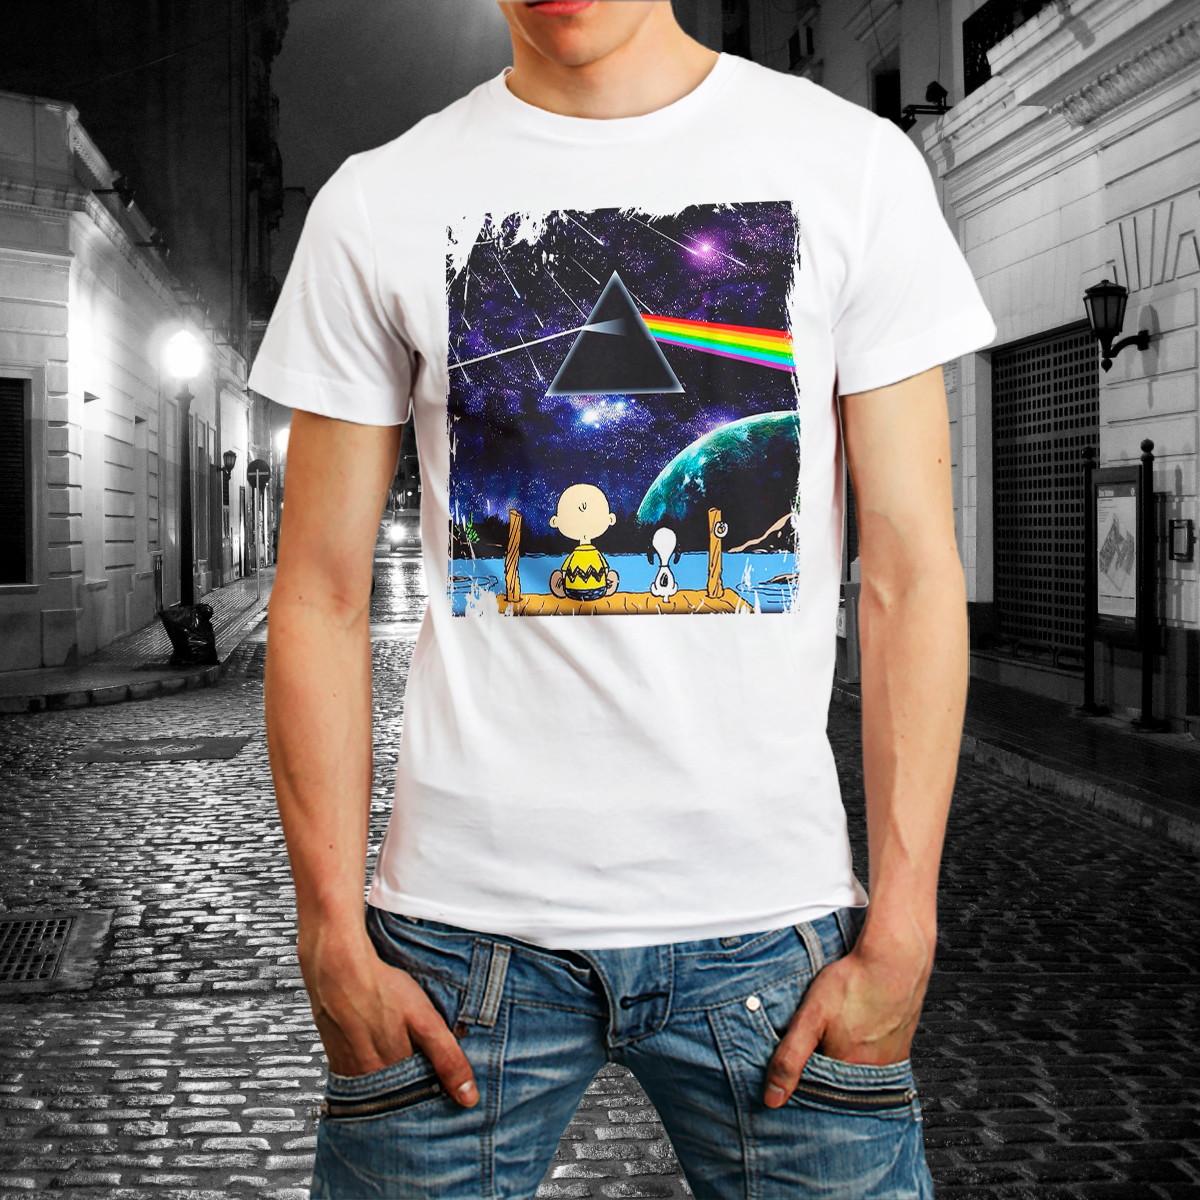 a440e95797a Camiseta Banda Rock Pink Floyd Camisa Roupa Masculina Branca no Elo7 ...